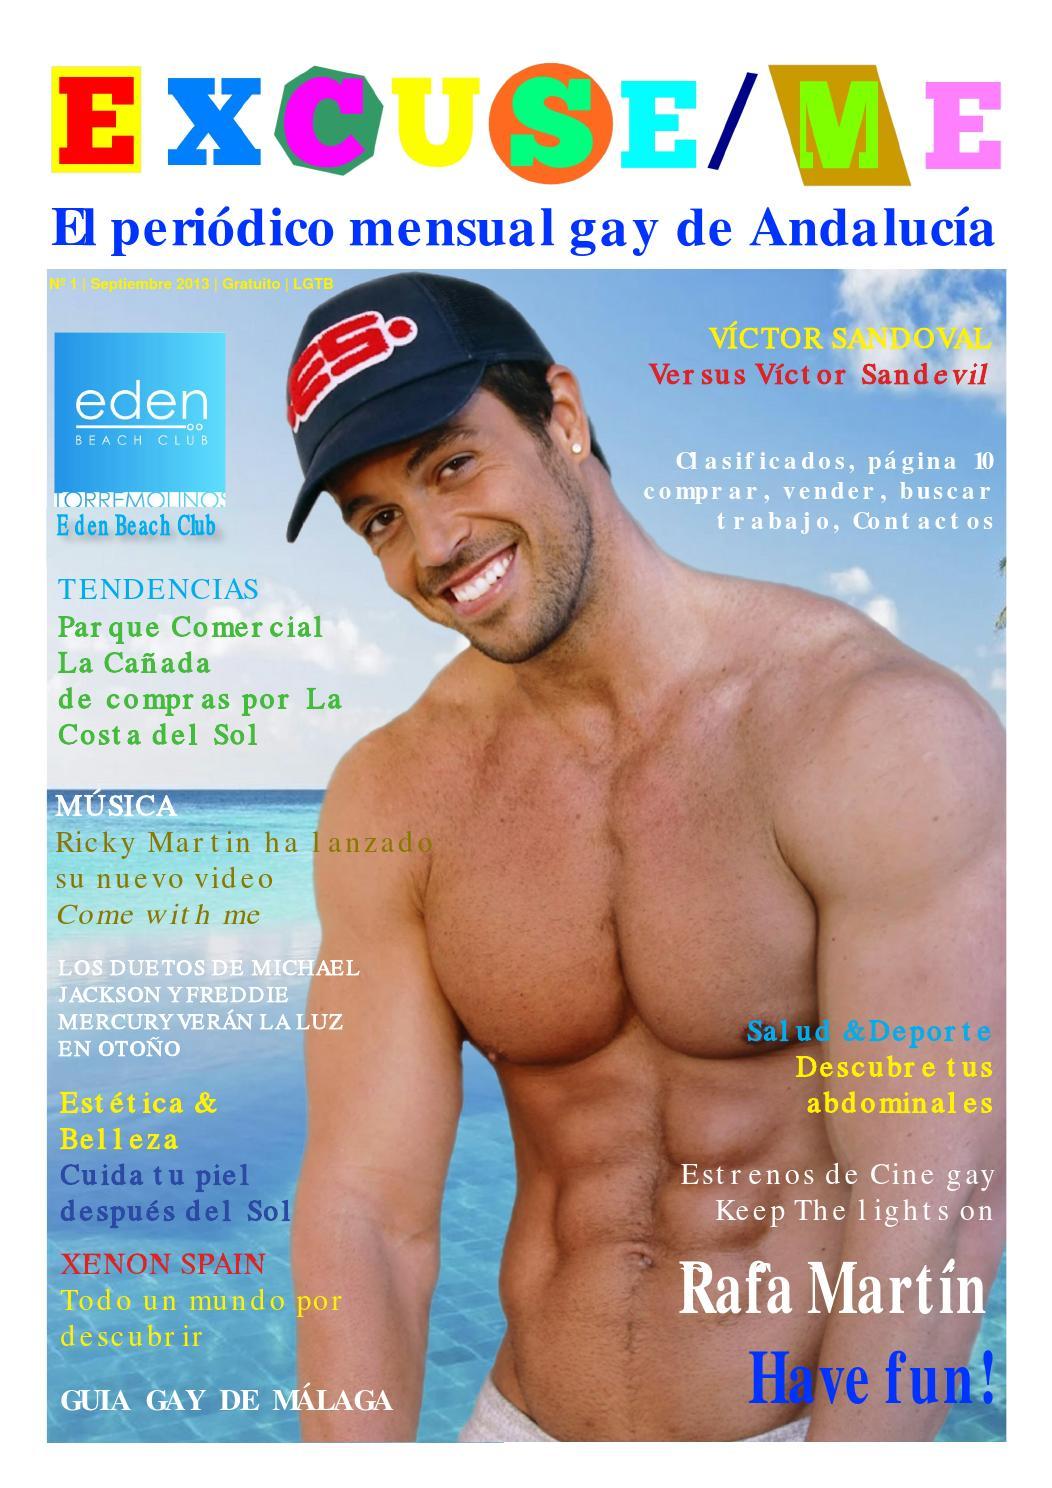 anuncios gay malaga